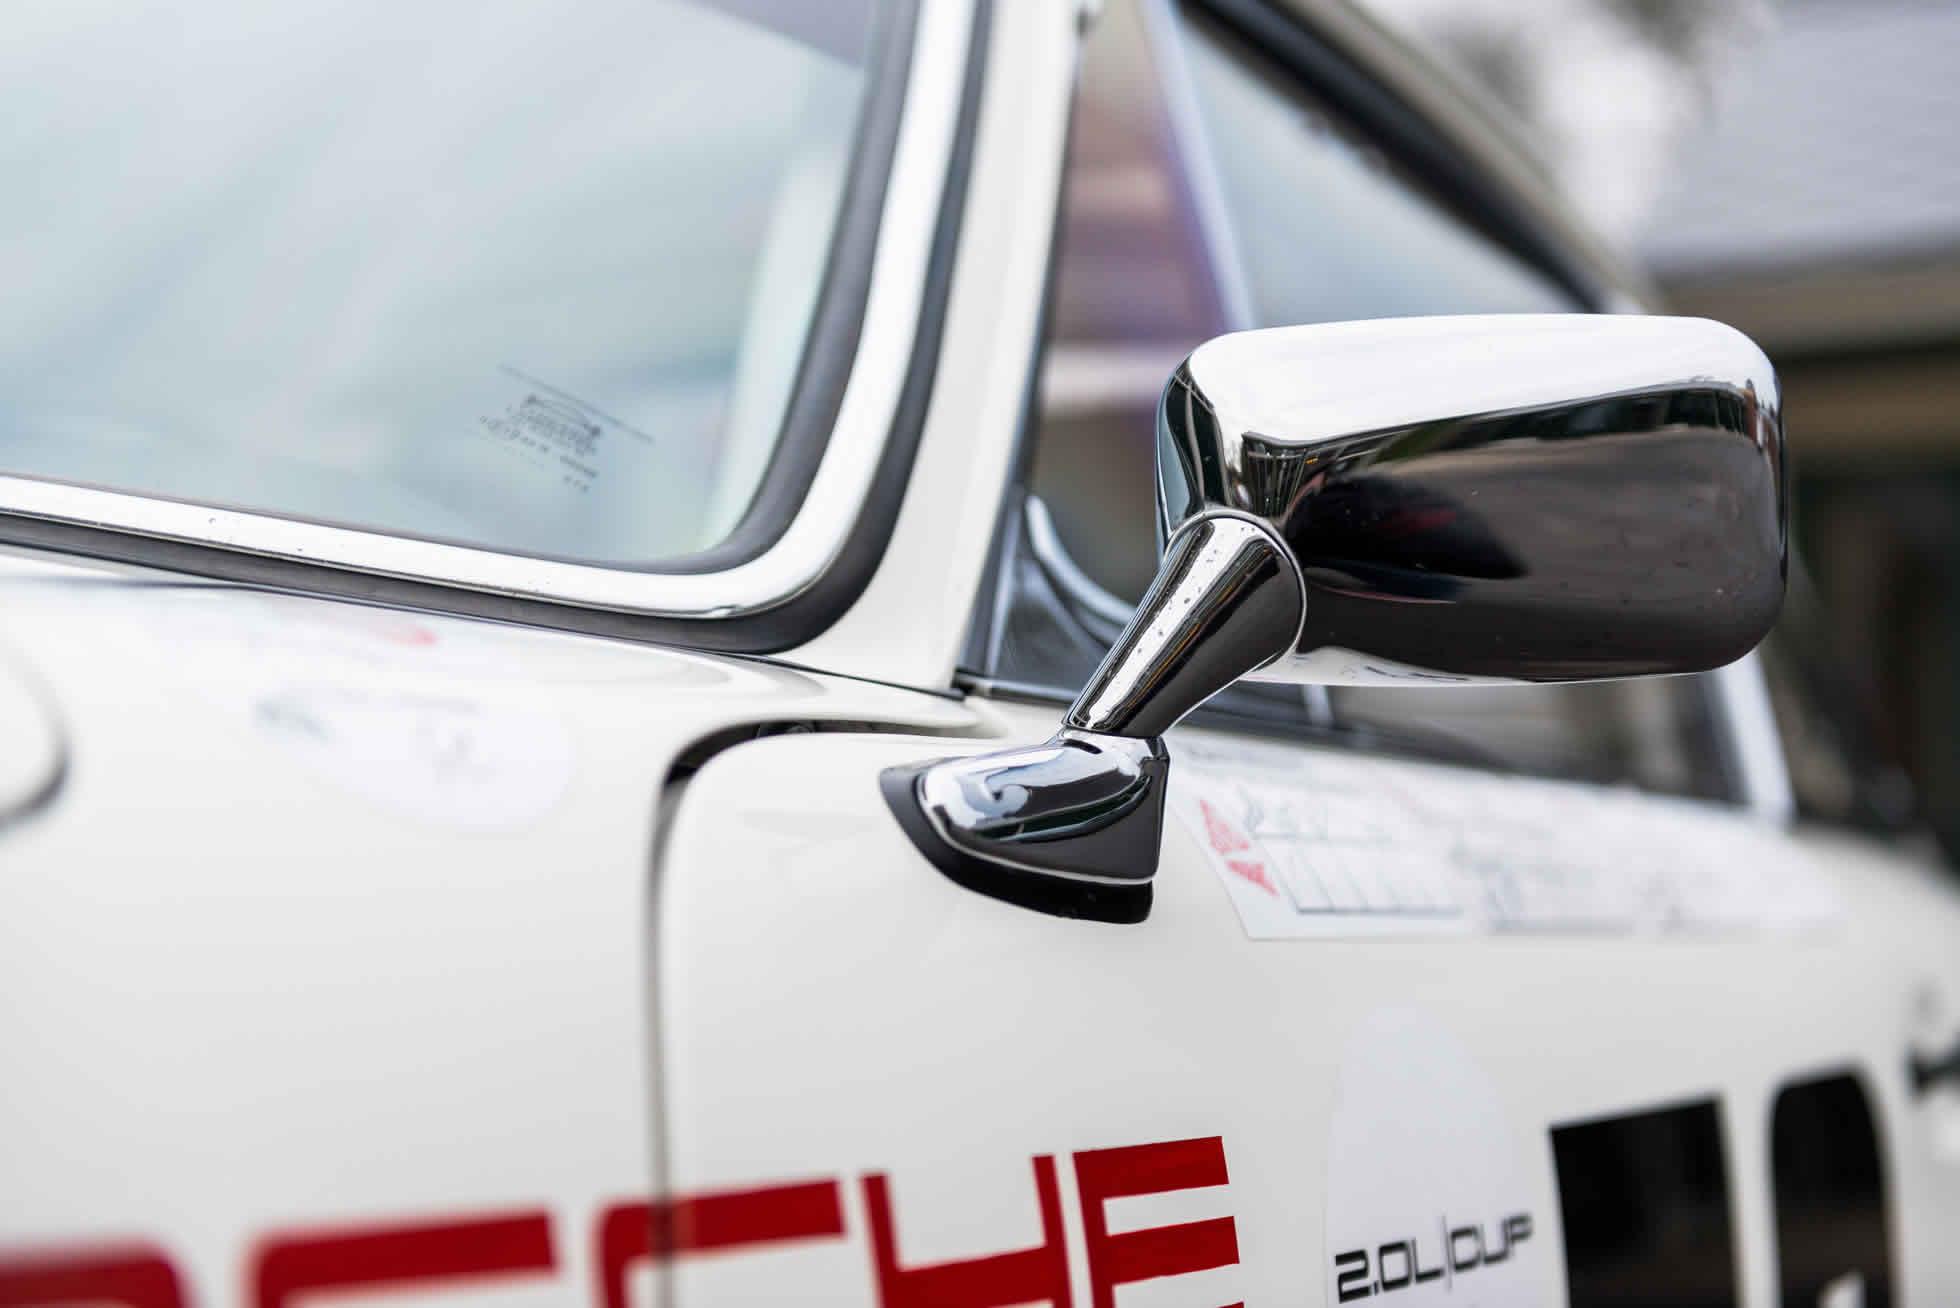 For Sale 1965 Porsche 911 2.0 SWB Race Car rear wing mirror